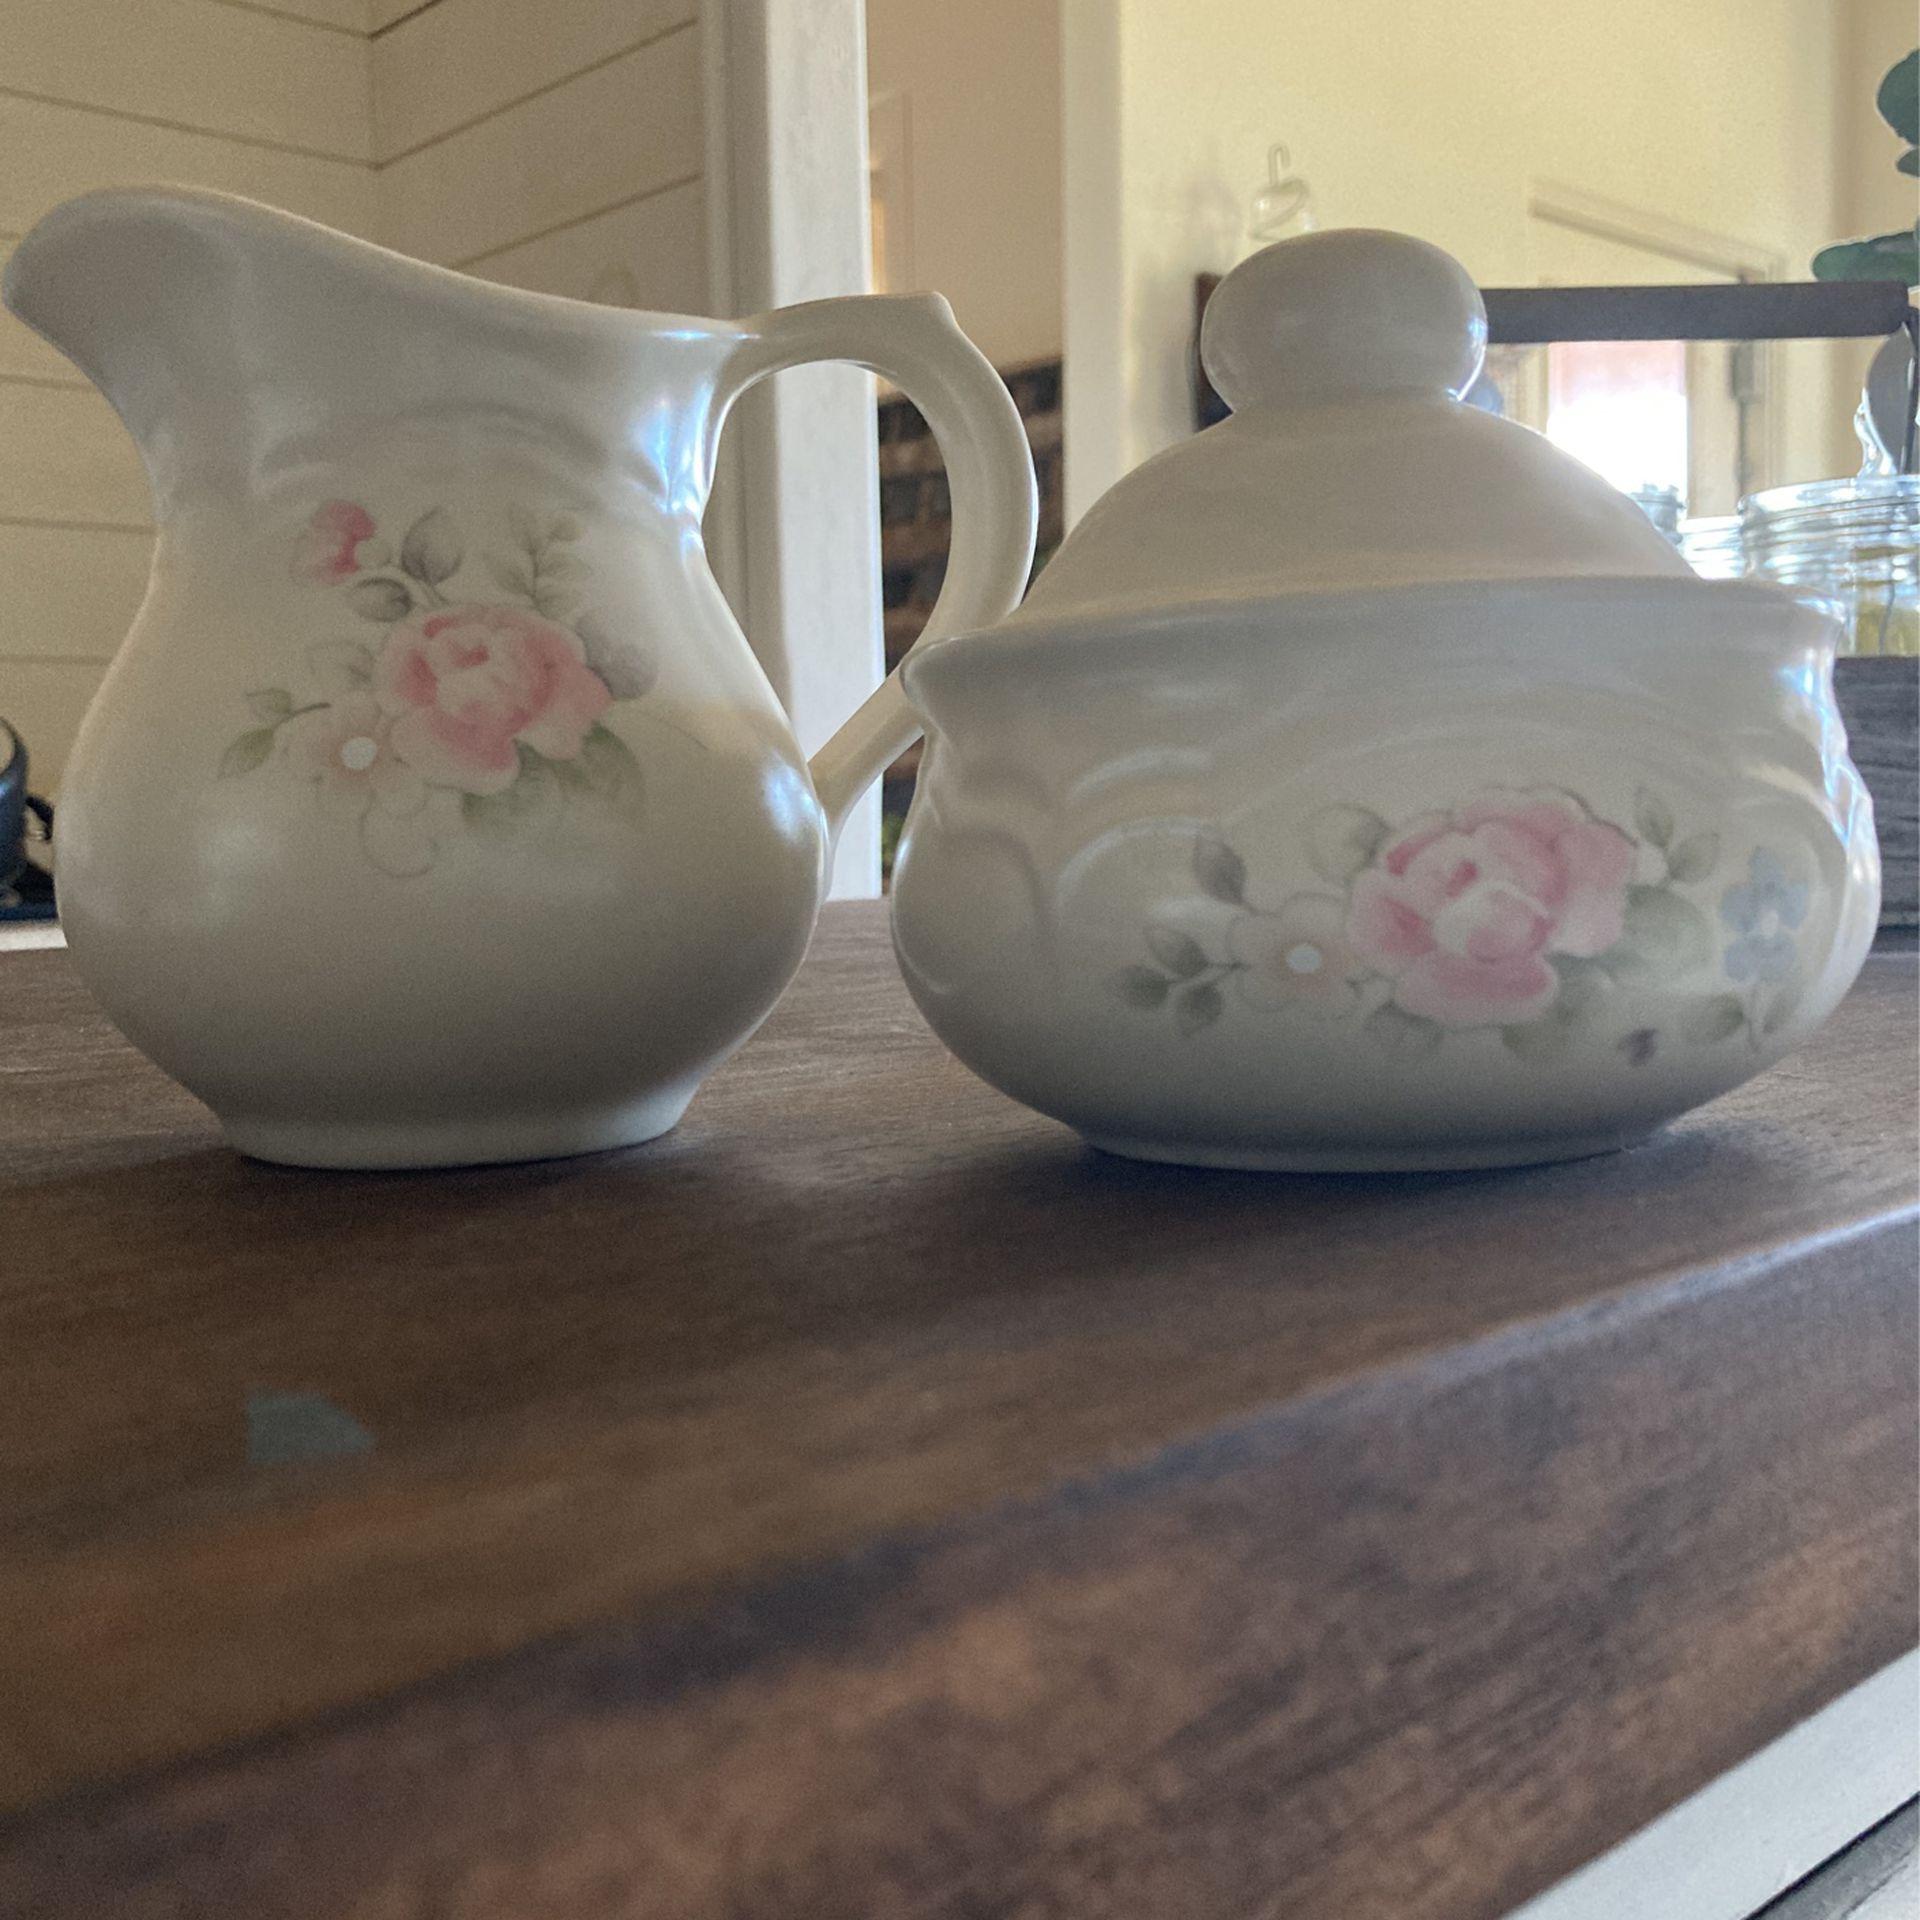 Pfaltzgraff Tea Rose Creamer and Sugar Bowl